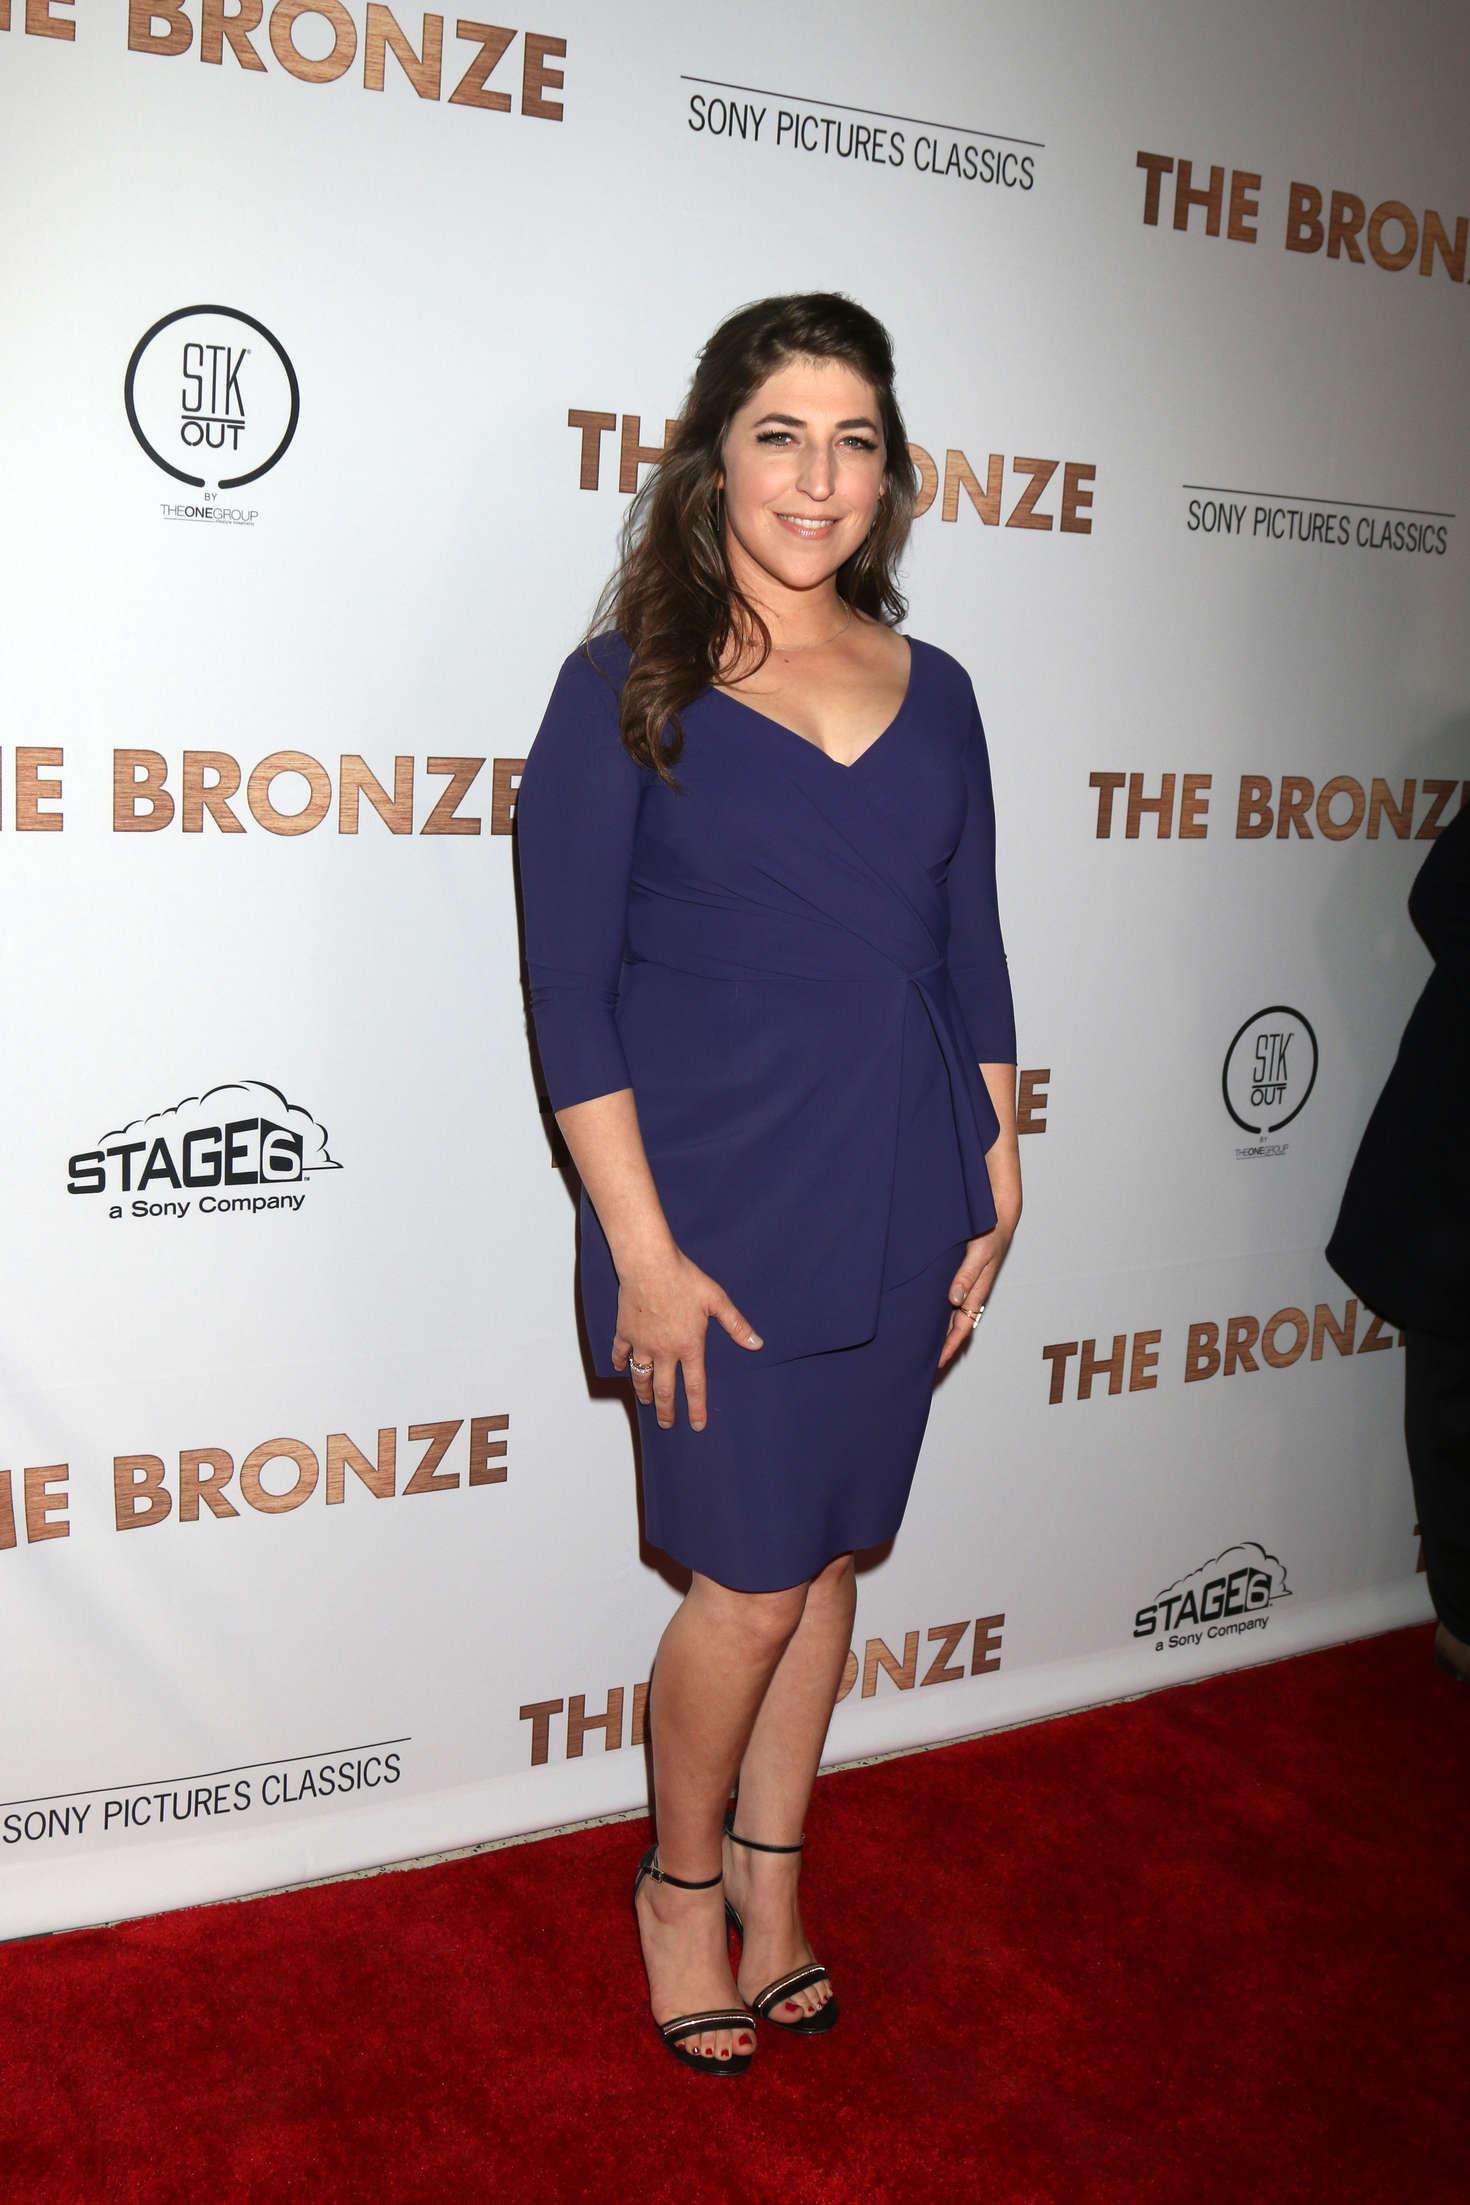 Mayim Bialik The Bronze Premiere in Los Angeles